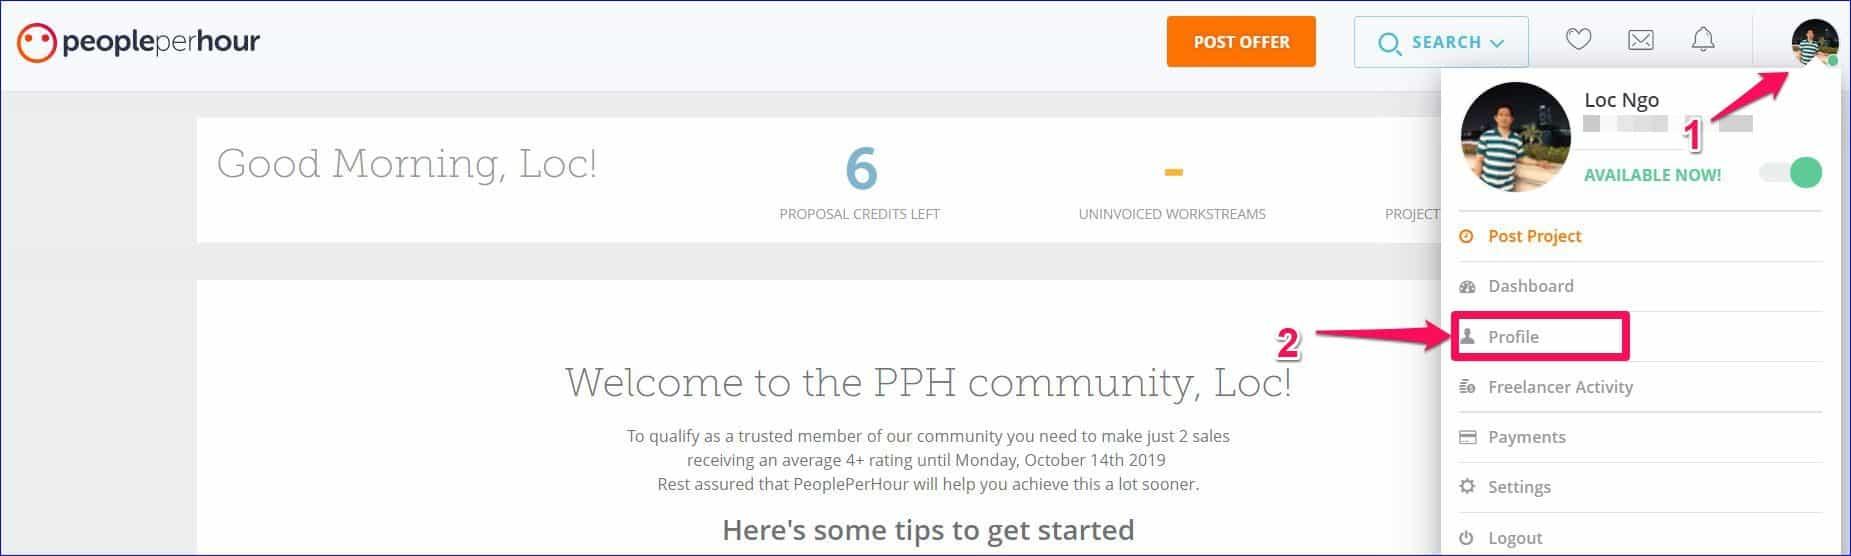 profile-PPH